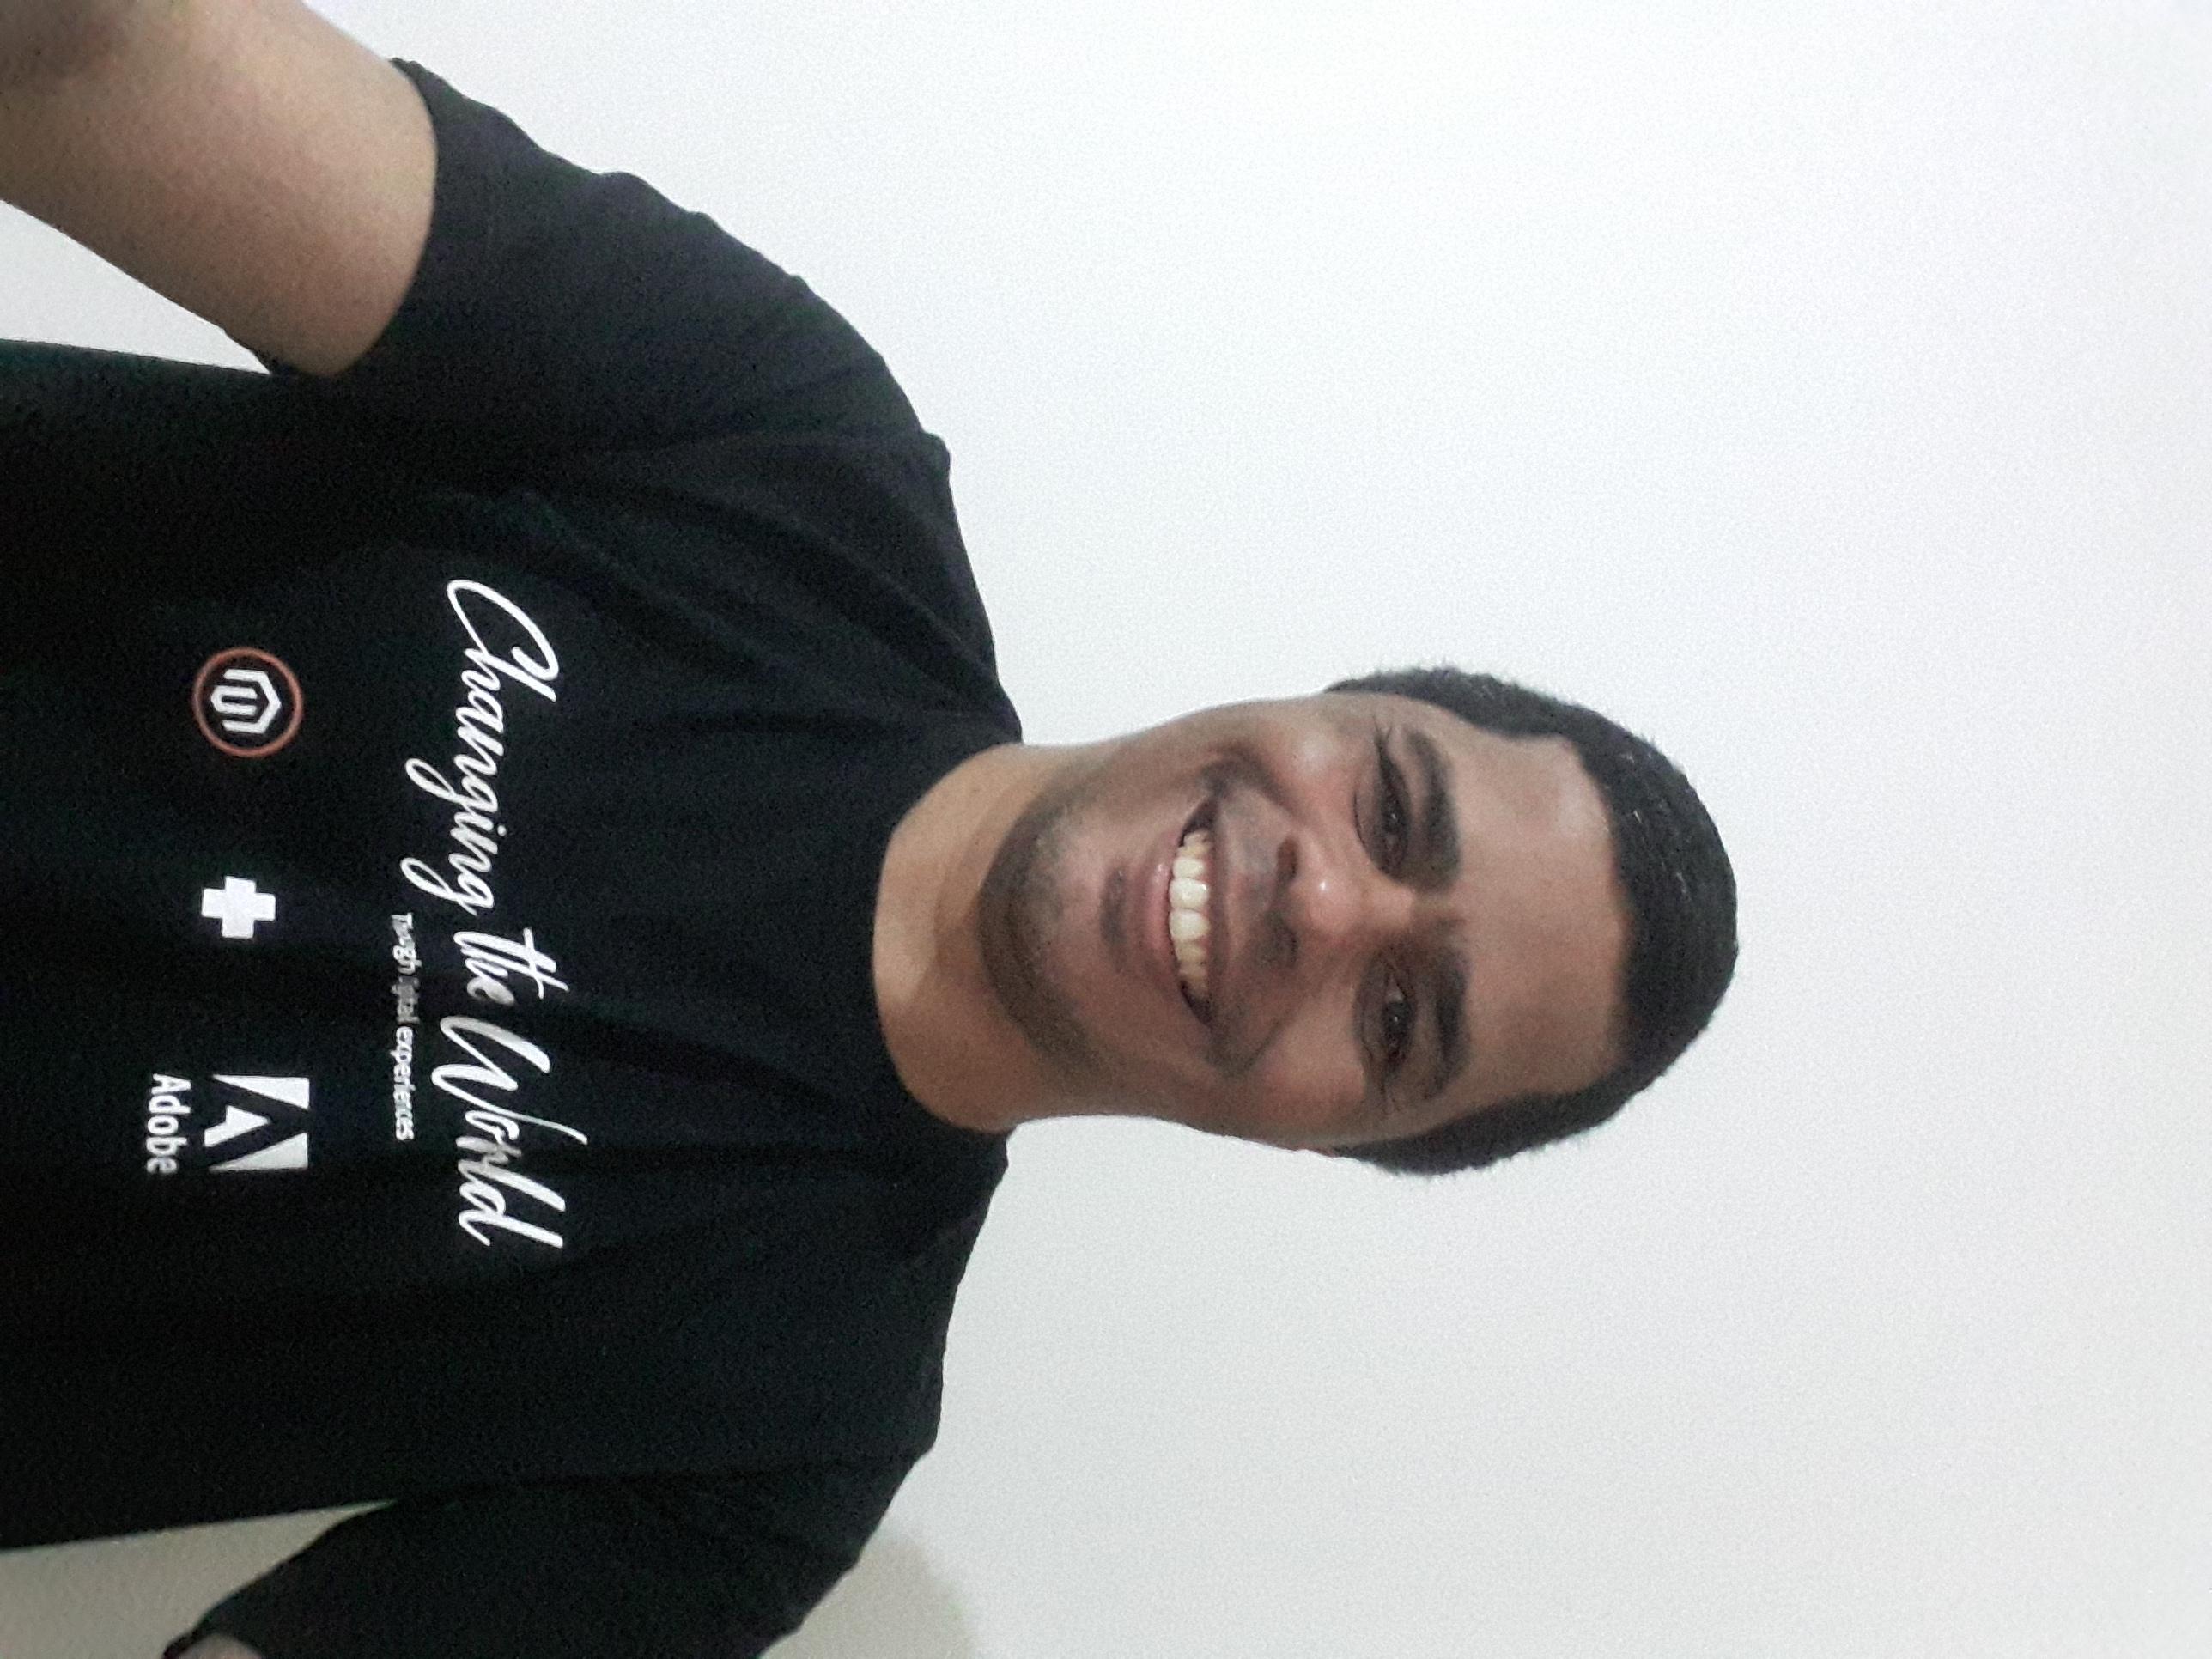 Alexander Alves